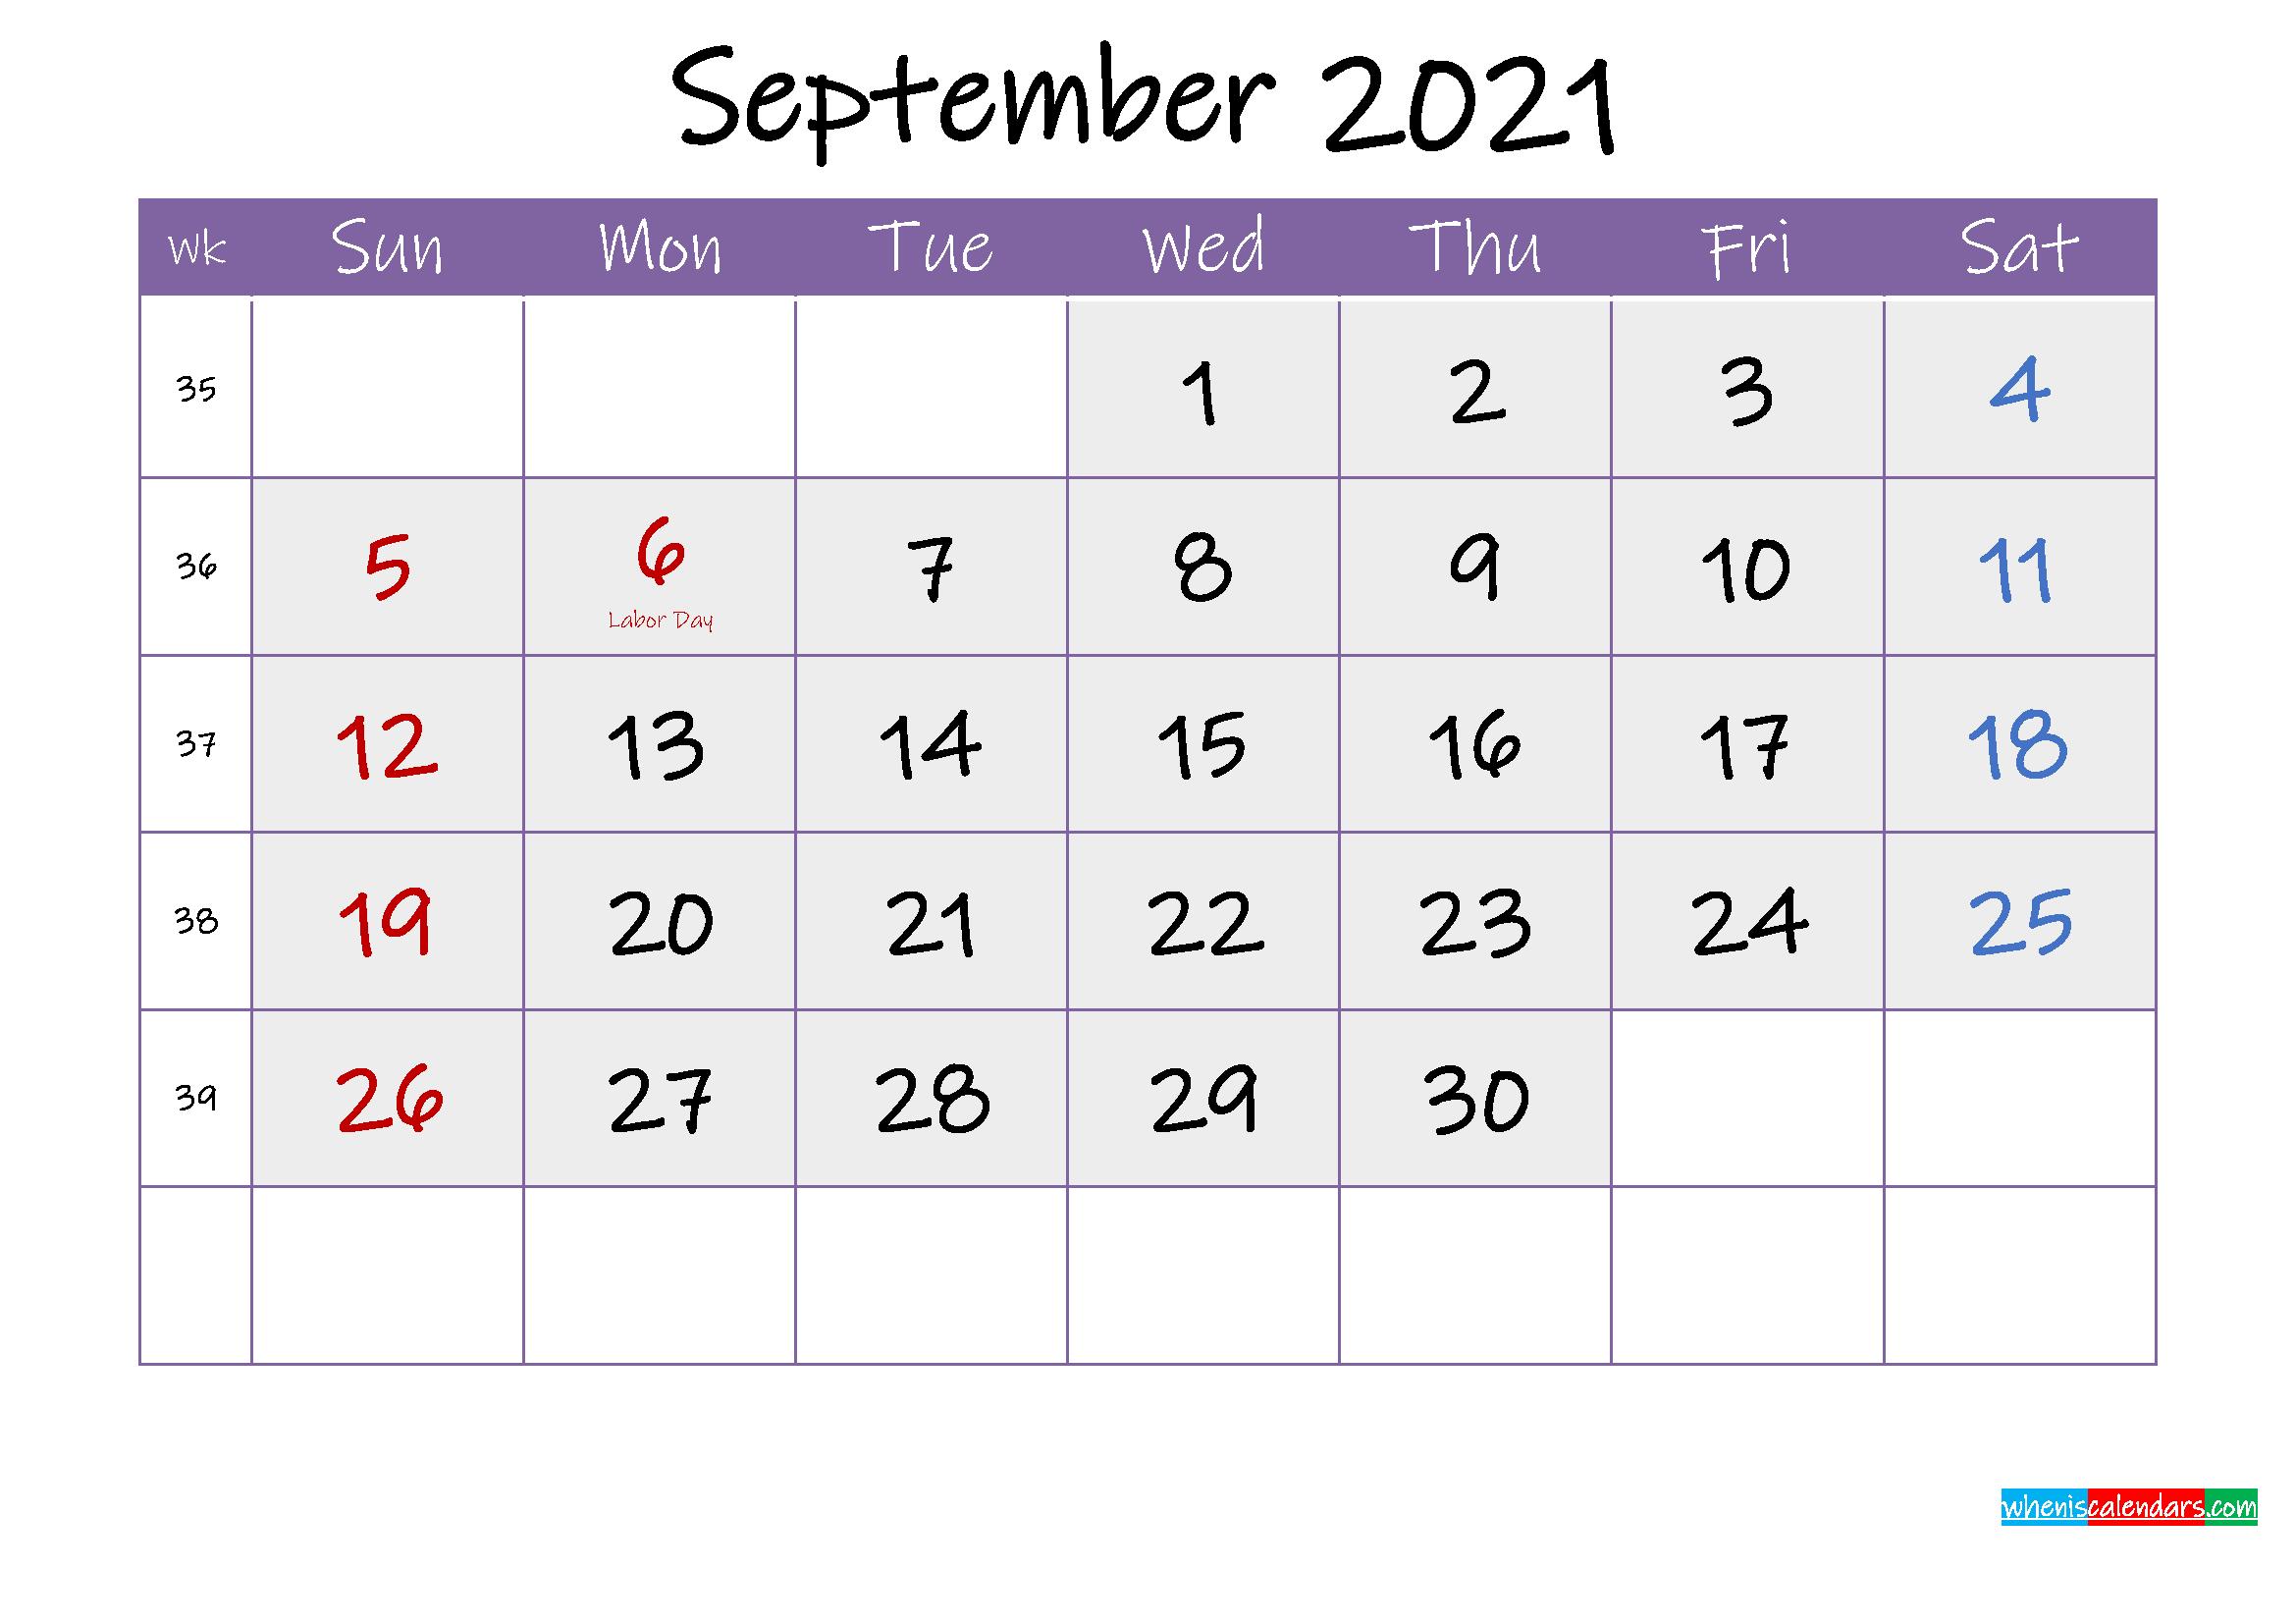 Free September 2021 Printable Calendar with Holidays